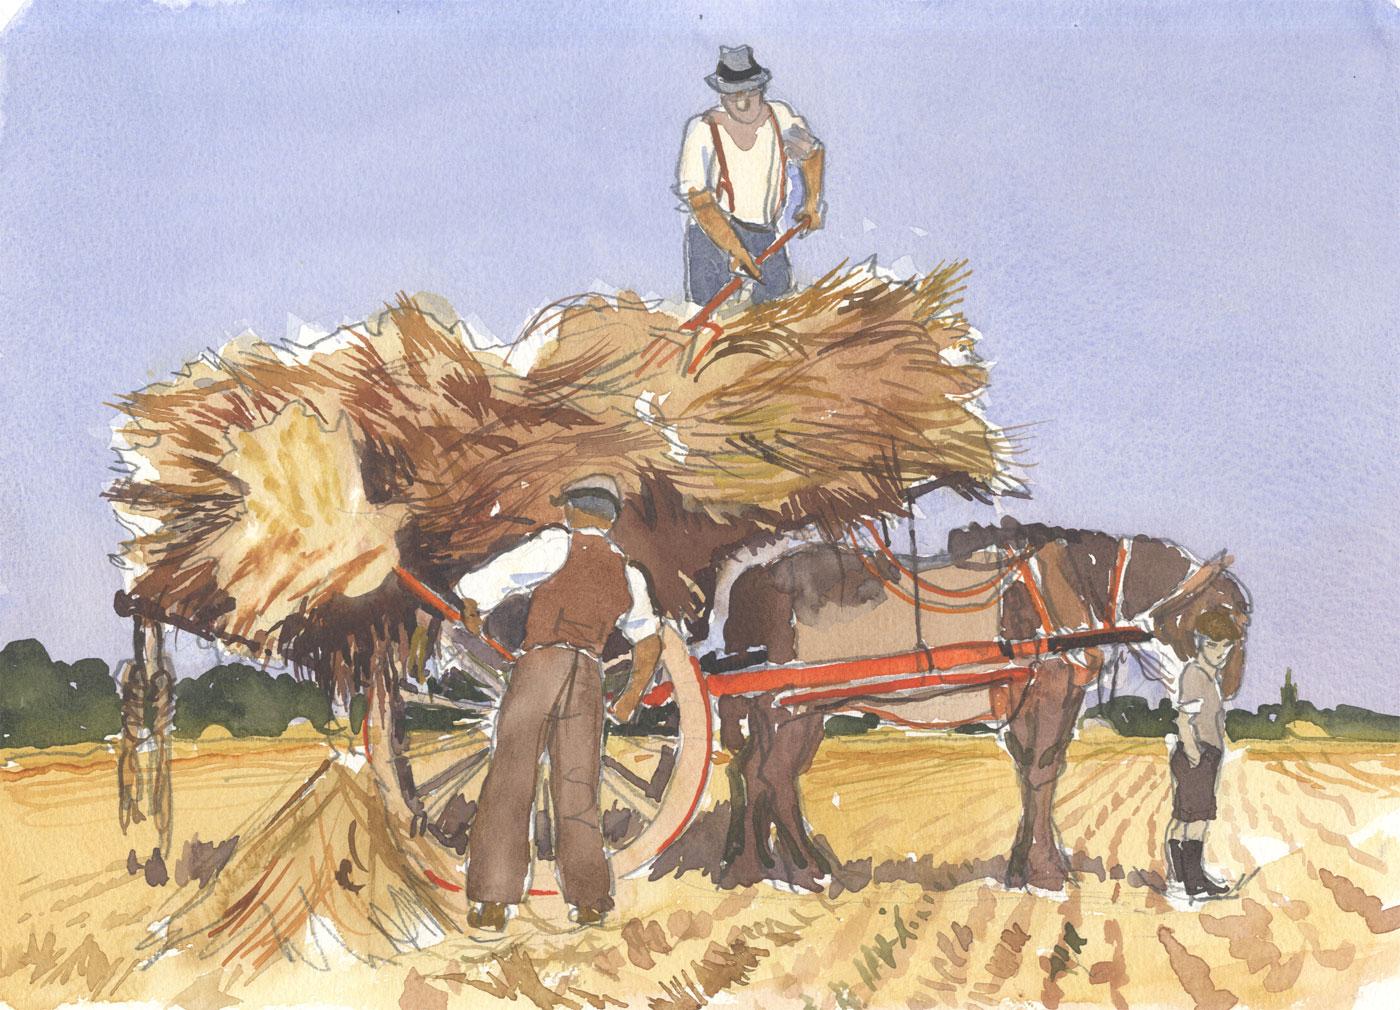 Robert T. Blayney (1929-2016) - Mid 20th Century Watercolour, Hay and Horse